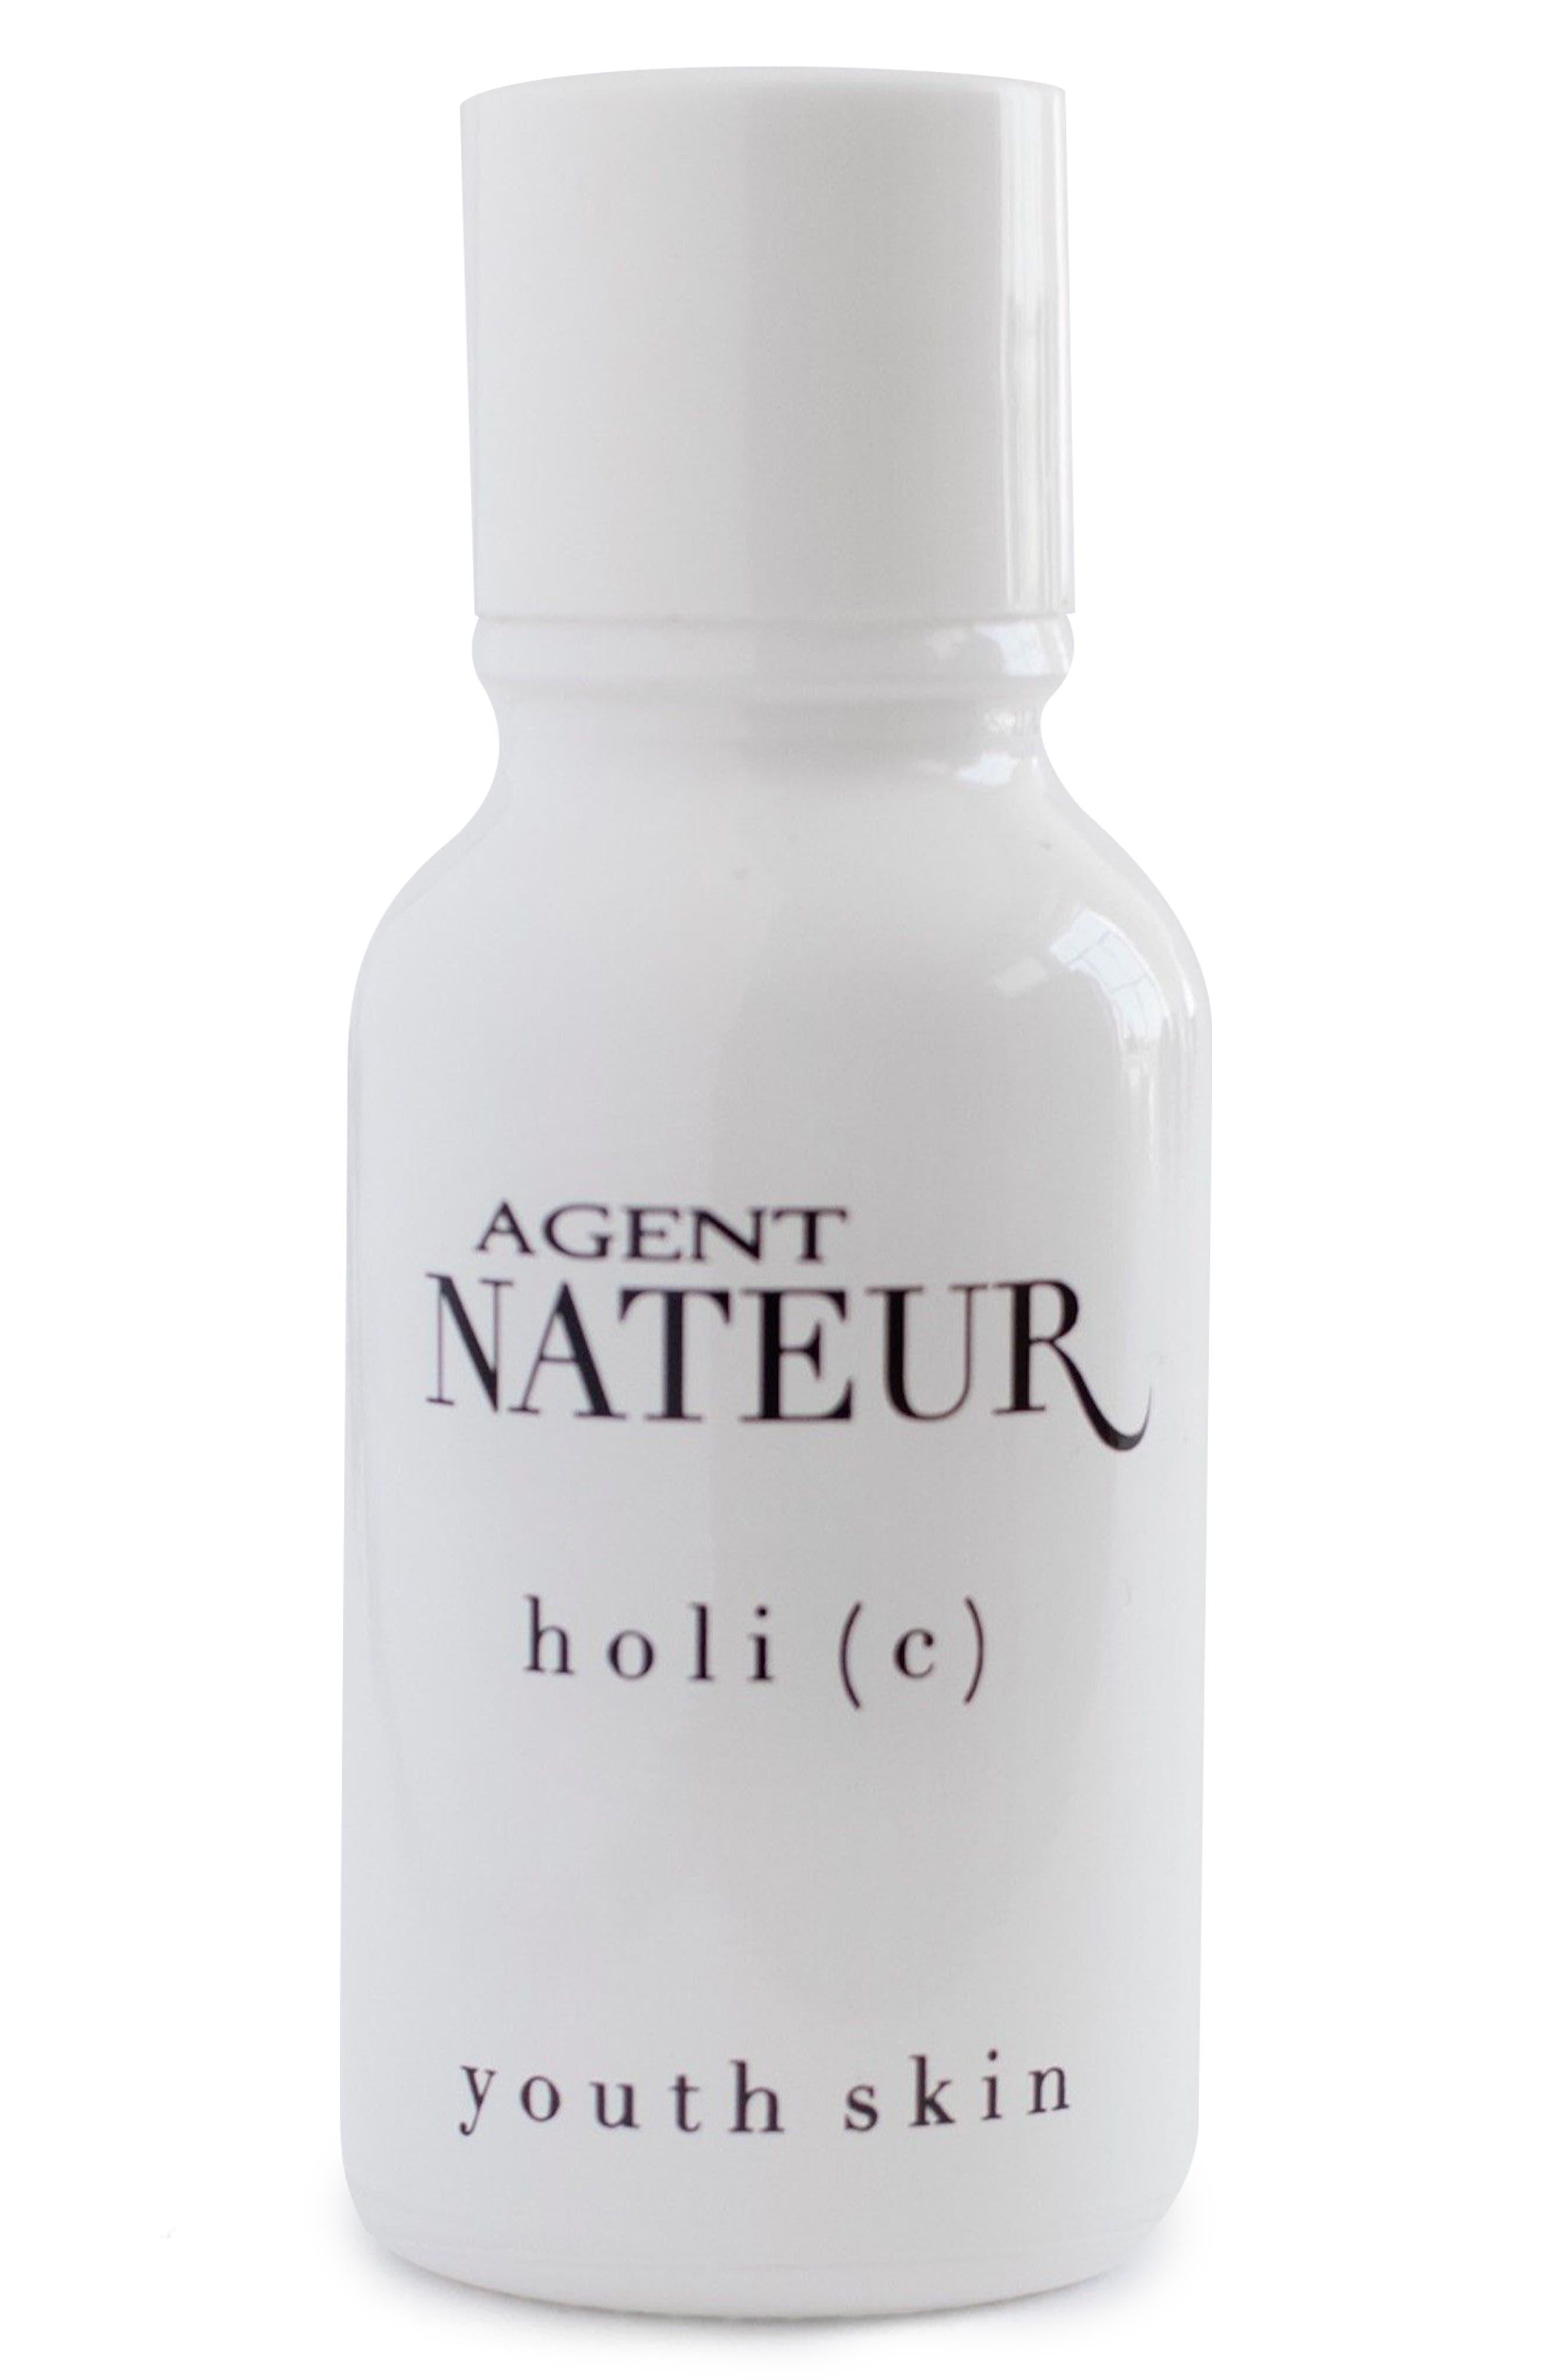 Main Image - Agent Nateur holi(c) Youth Skin